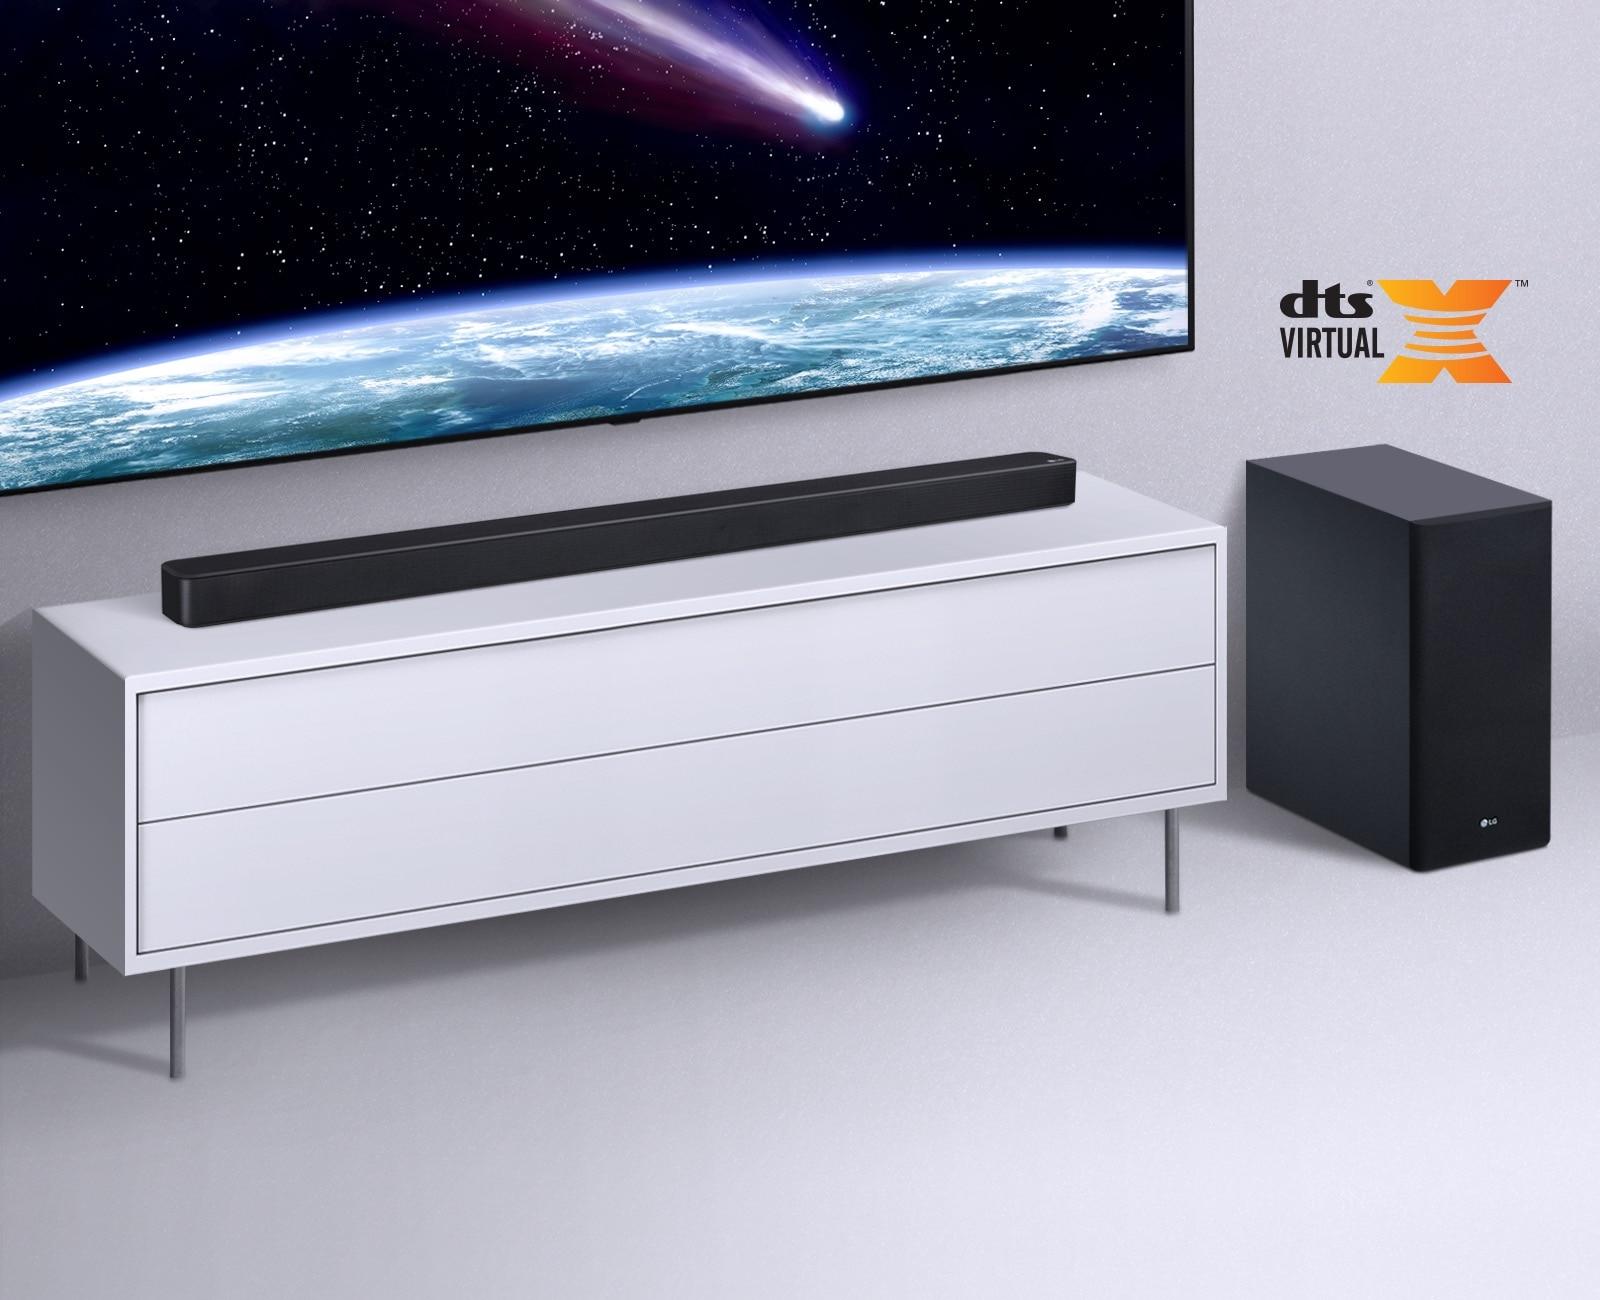 CAV-SoundBar-SL6Y-01-Immersive-Sound-DTS-Virtual-X-Desktop-v1